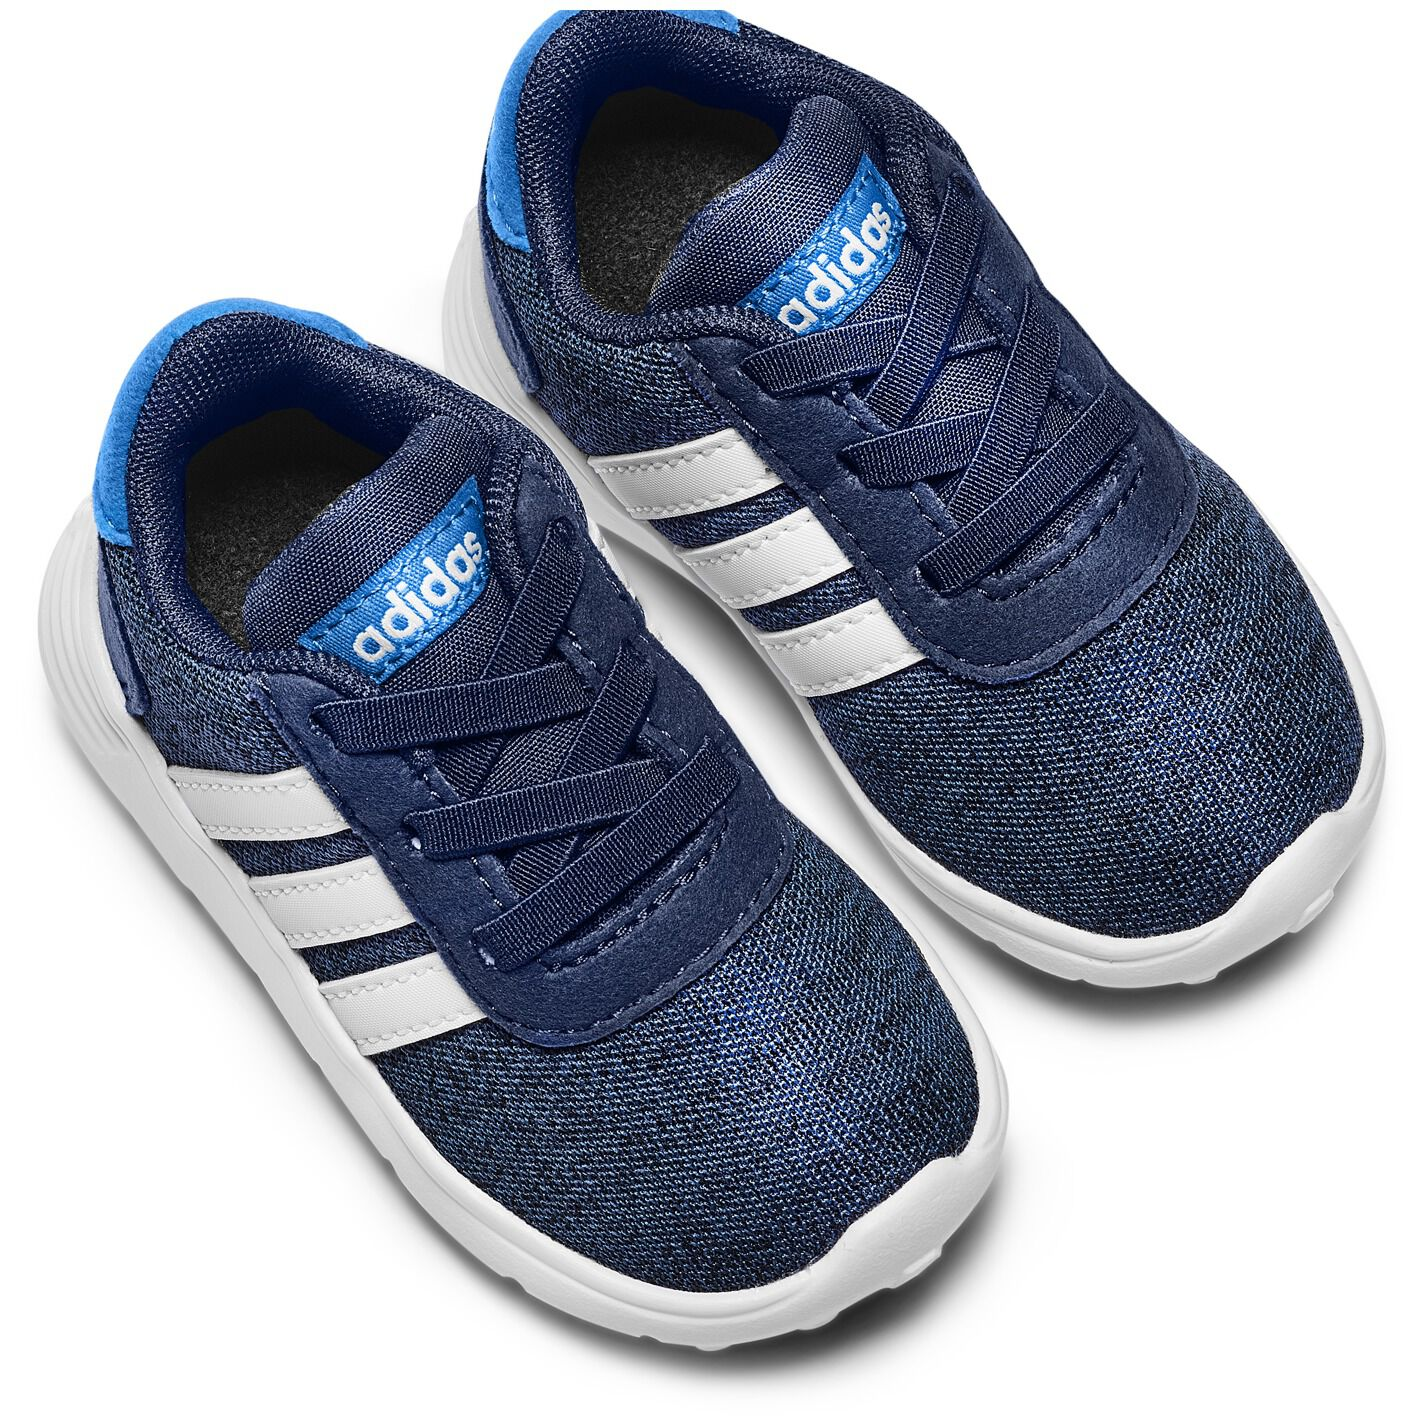 scarpe bambino 24 adidas